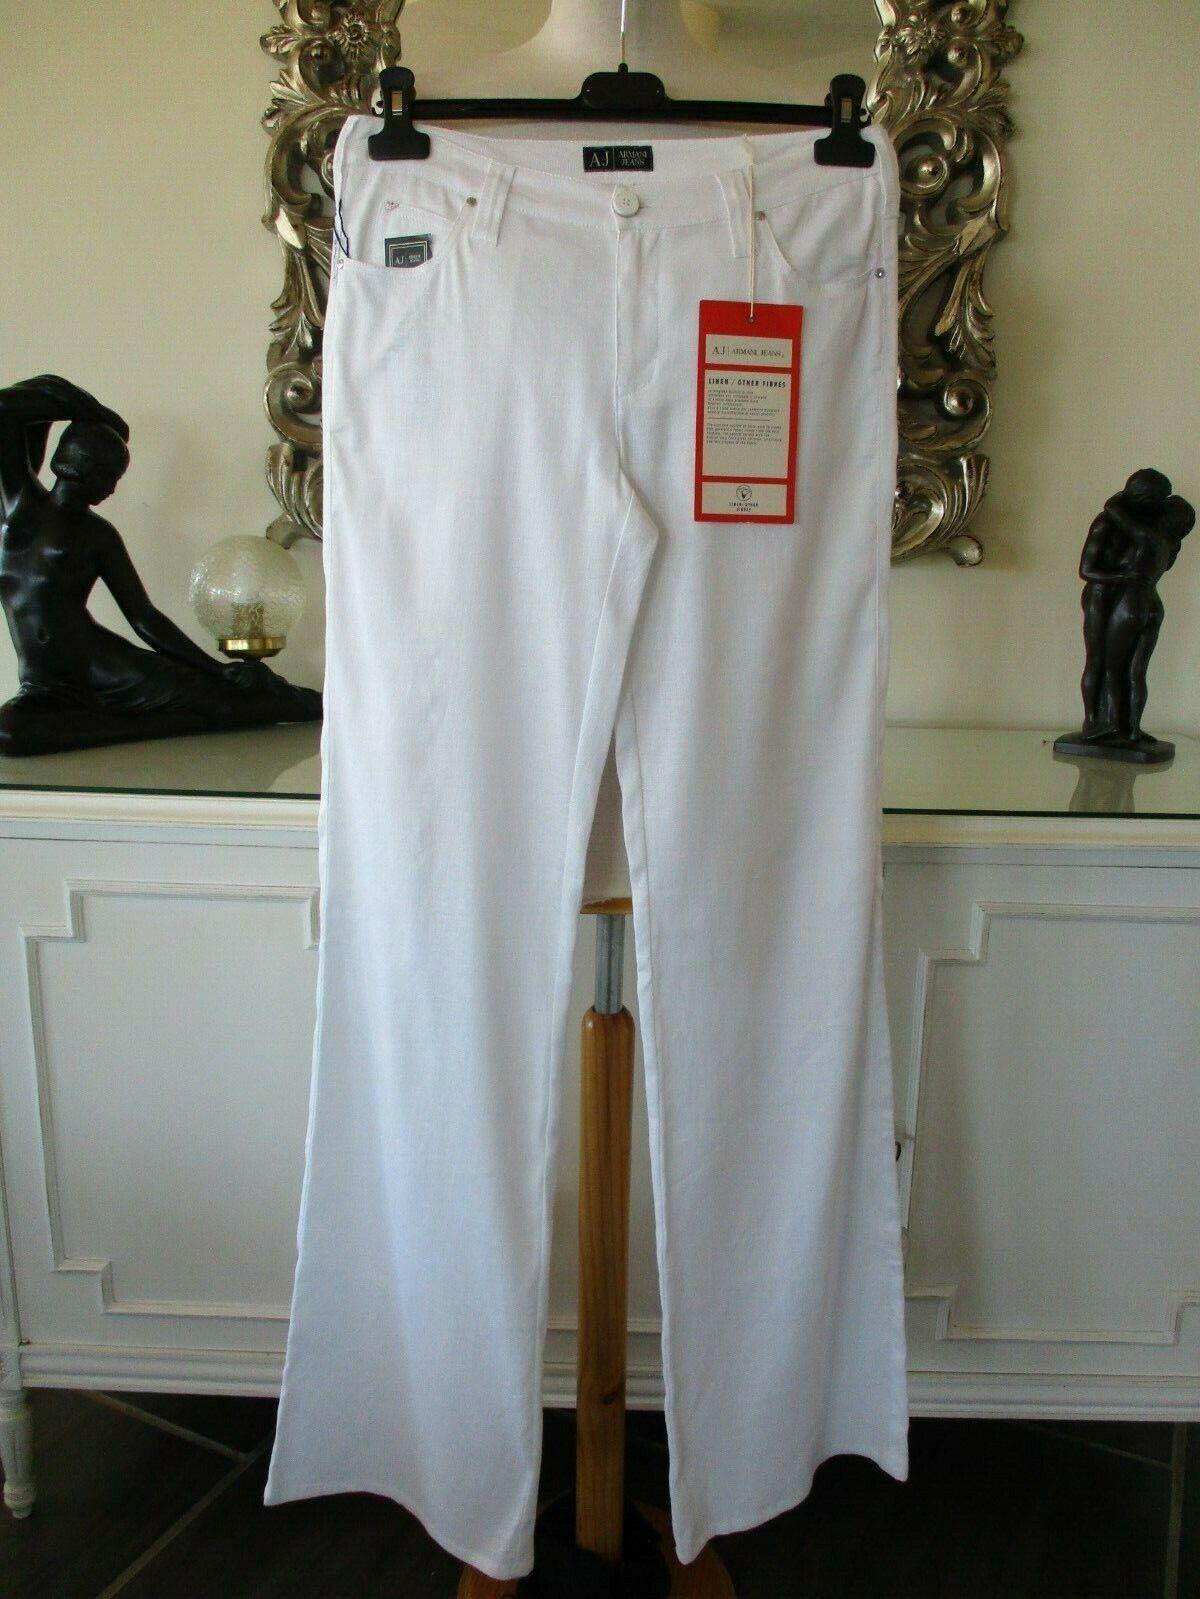 ARMANI ARMANI ARMANI JEANS Weiß Linen Cotton Blend Wide Leg Designer Trousers 27 W 10 12 BNWT   Sonderpreis  211755